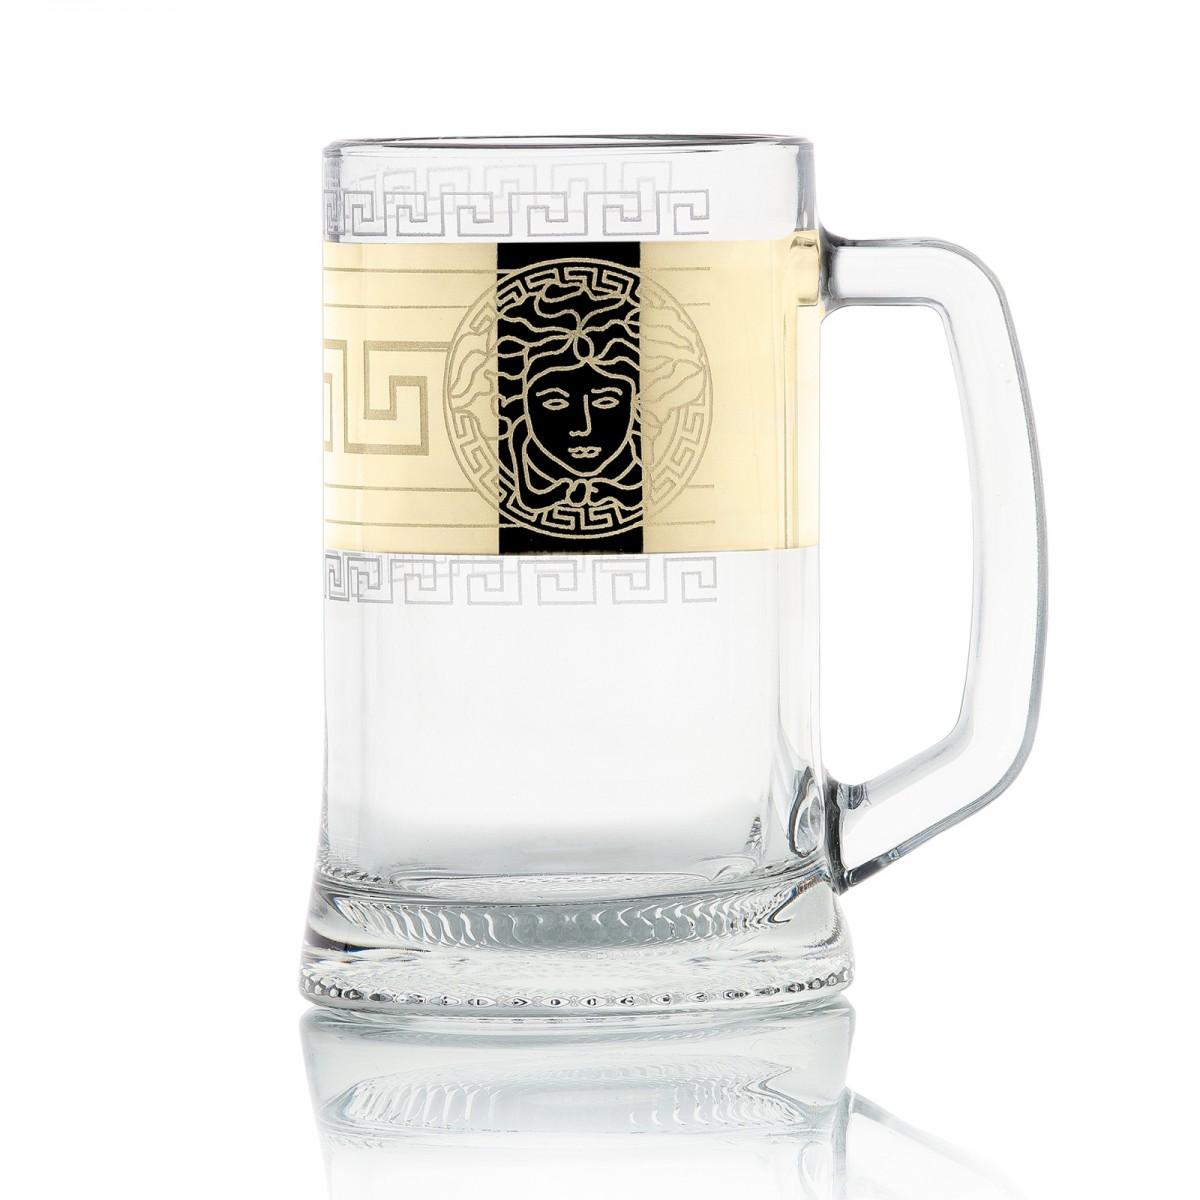 GN3_1144_0 Кружка для пива «Версаль», 500 мл